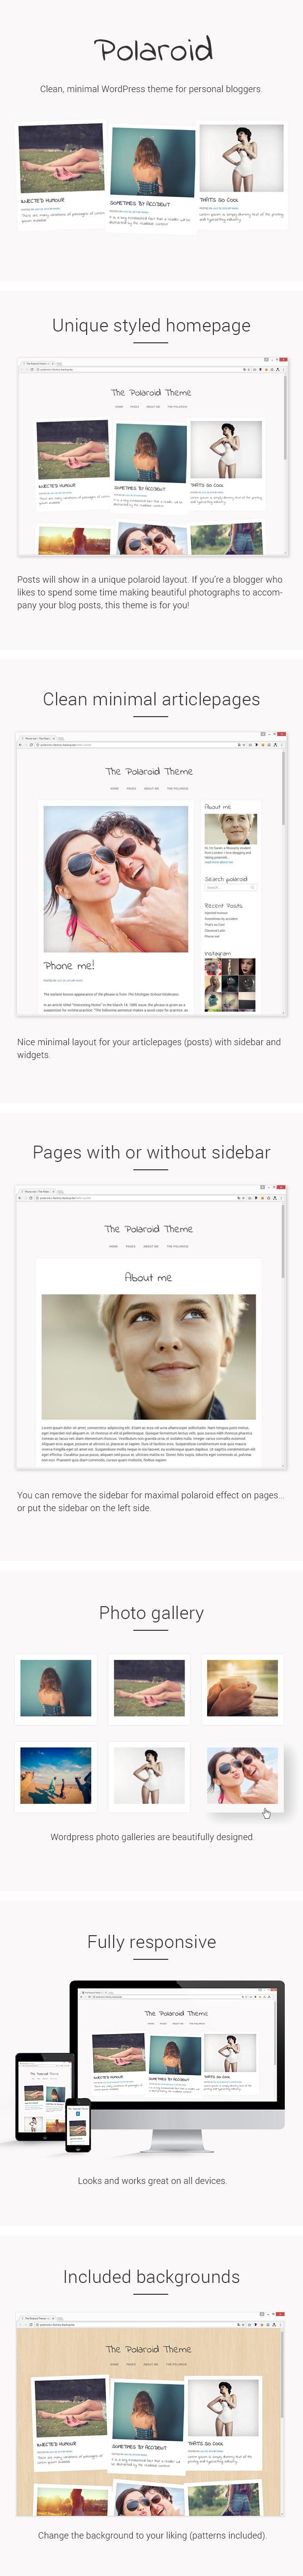 Polaroid features Polaroid - Unique Personal Blog Theme for WordPress (Personal) Polaroid - Unique Personal Blog Theme for WordPress (Personal) preview themeforest